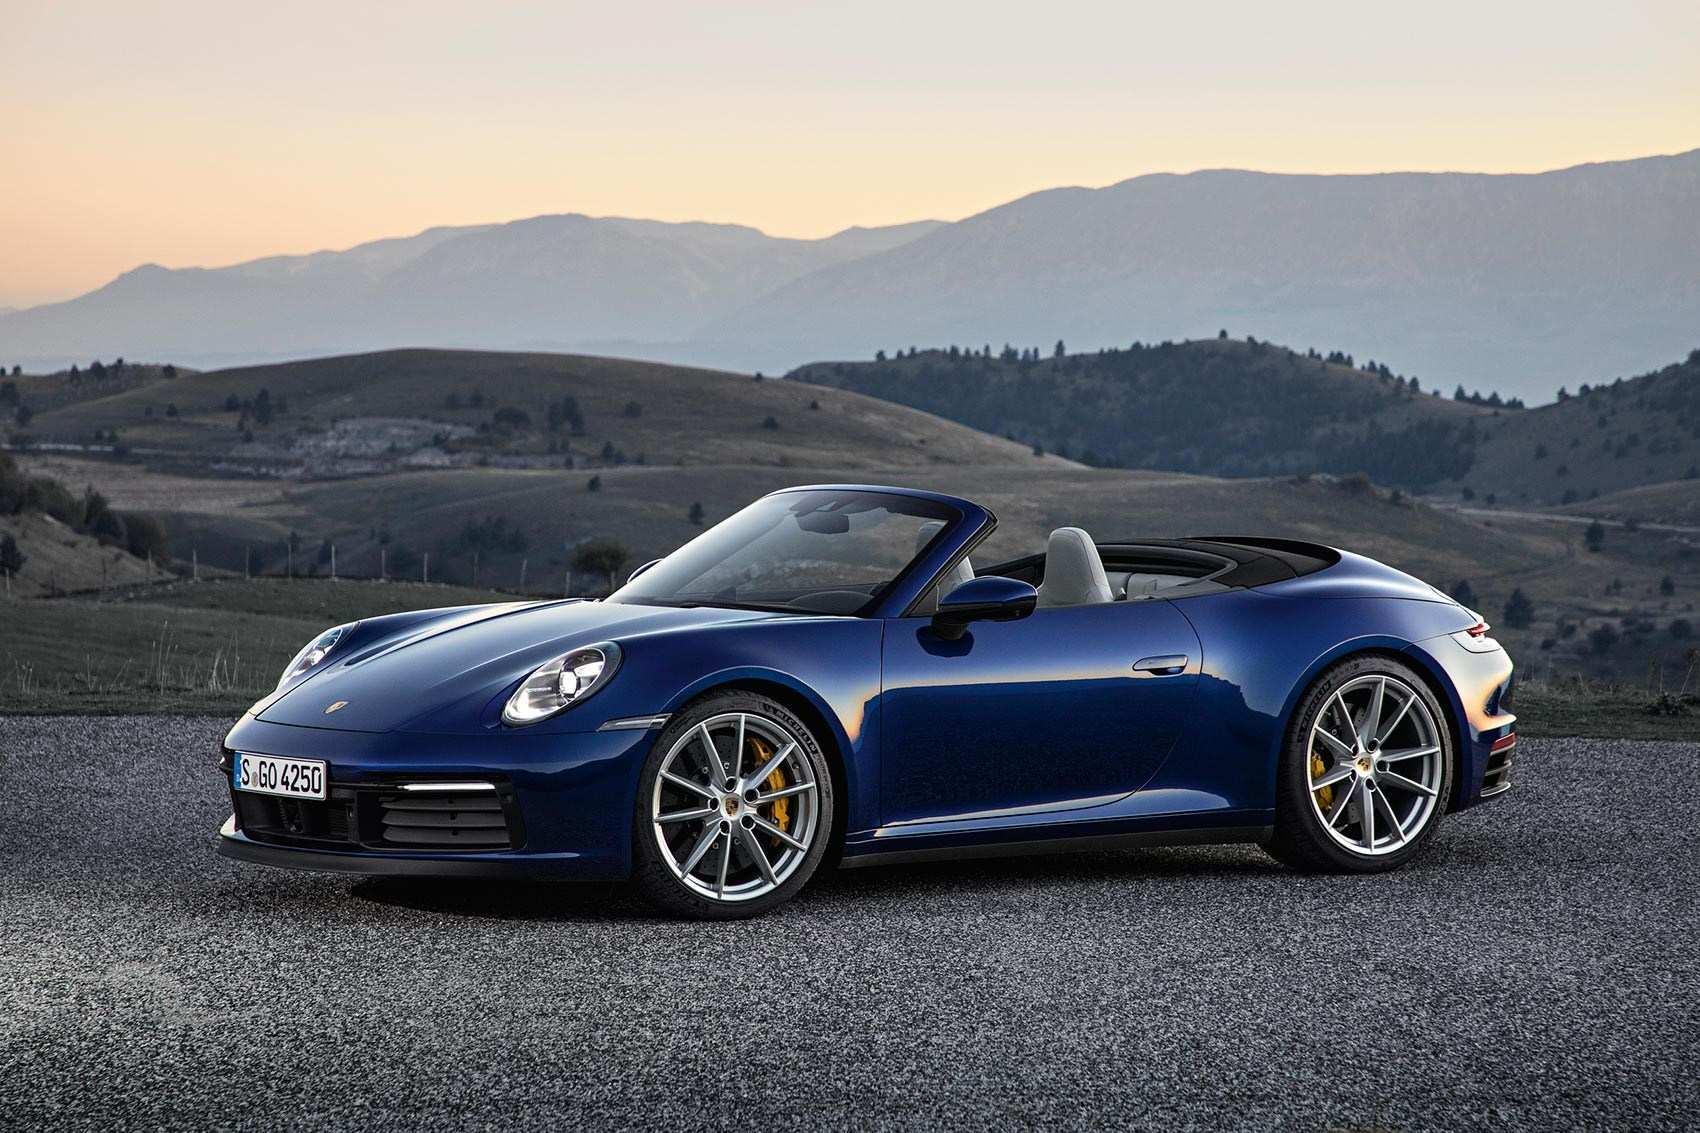 54 All New 2019 Porsche Release Overview for 2019 Porsche Release